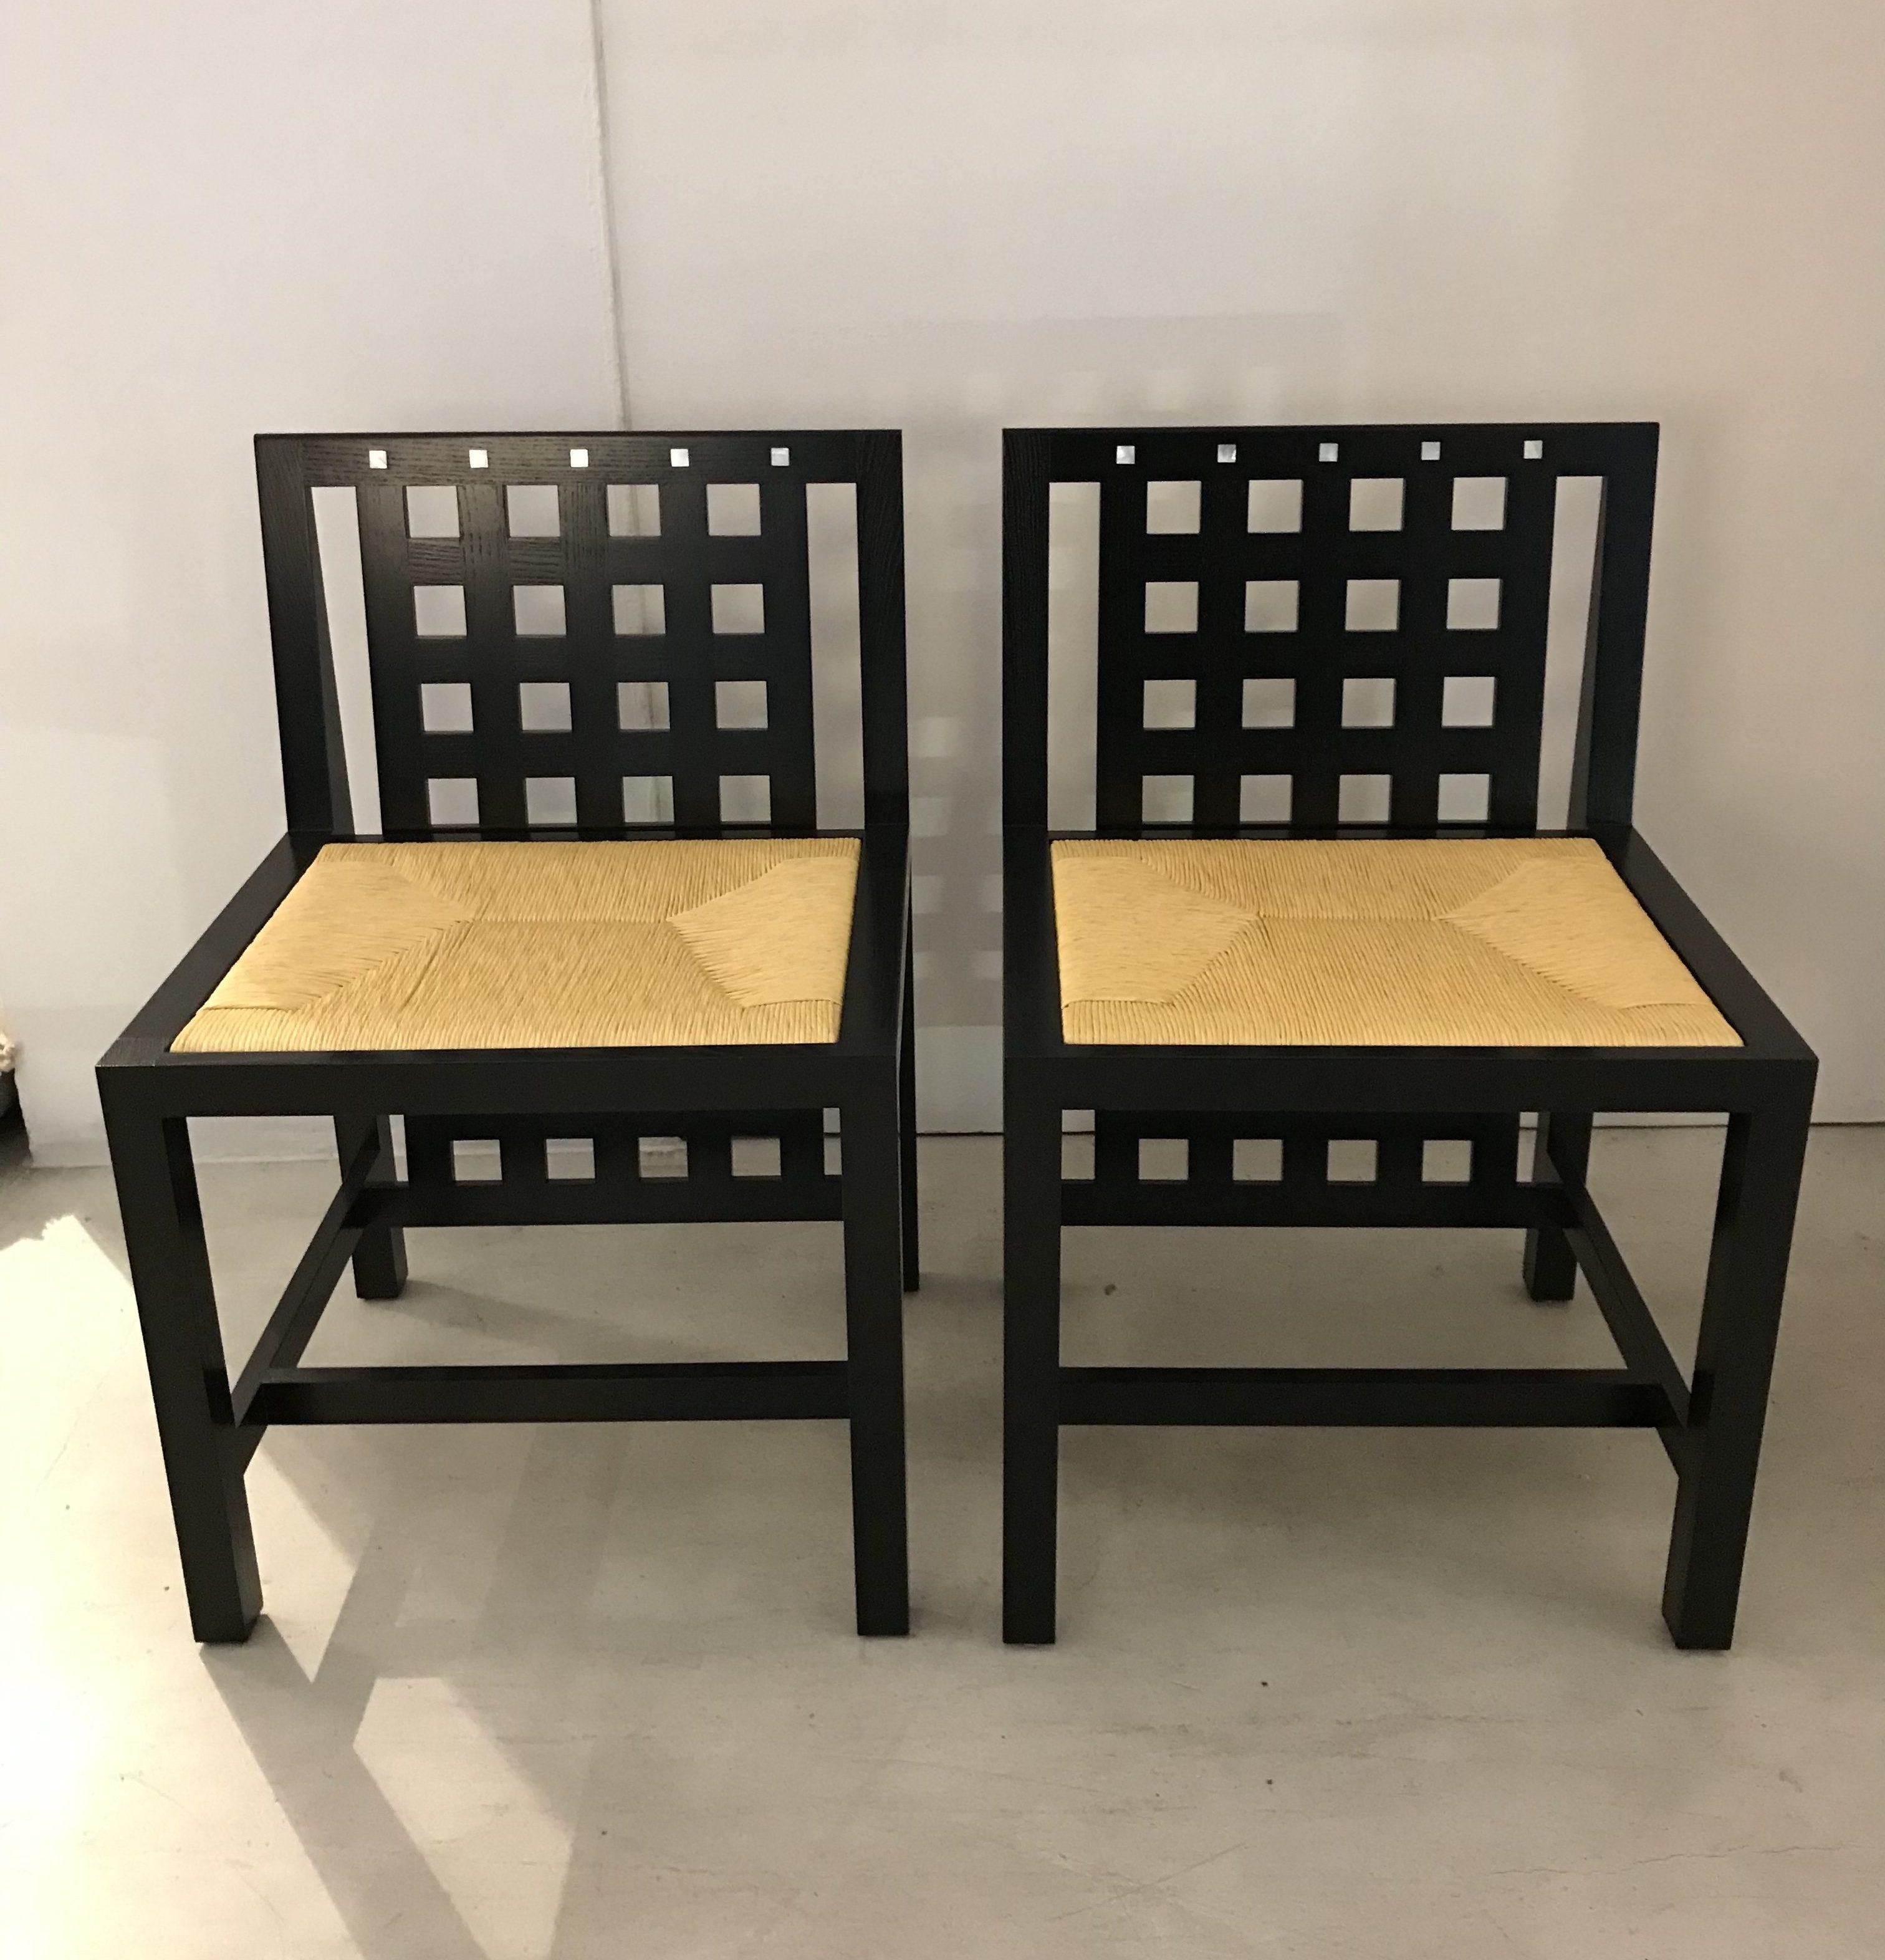 DS3 chair design Charles Rennie Machintosh original Cassina Made in Italy